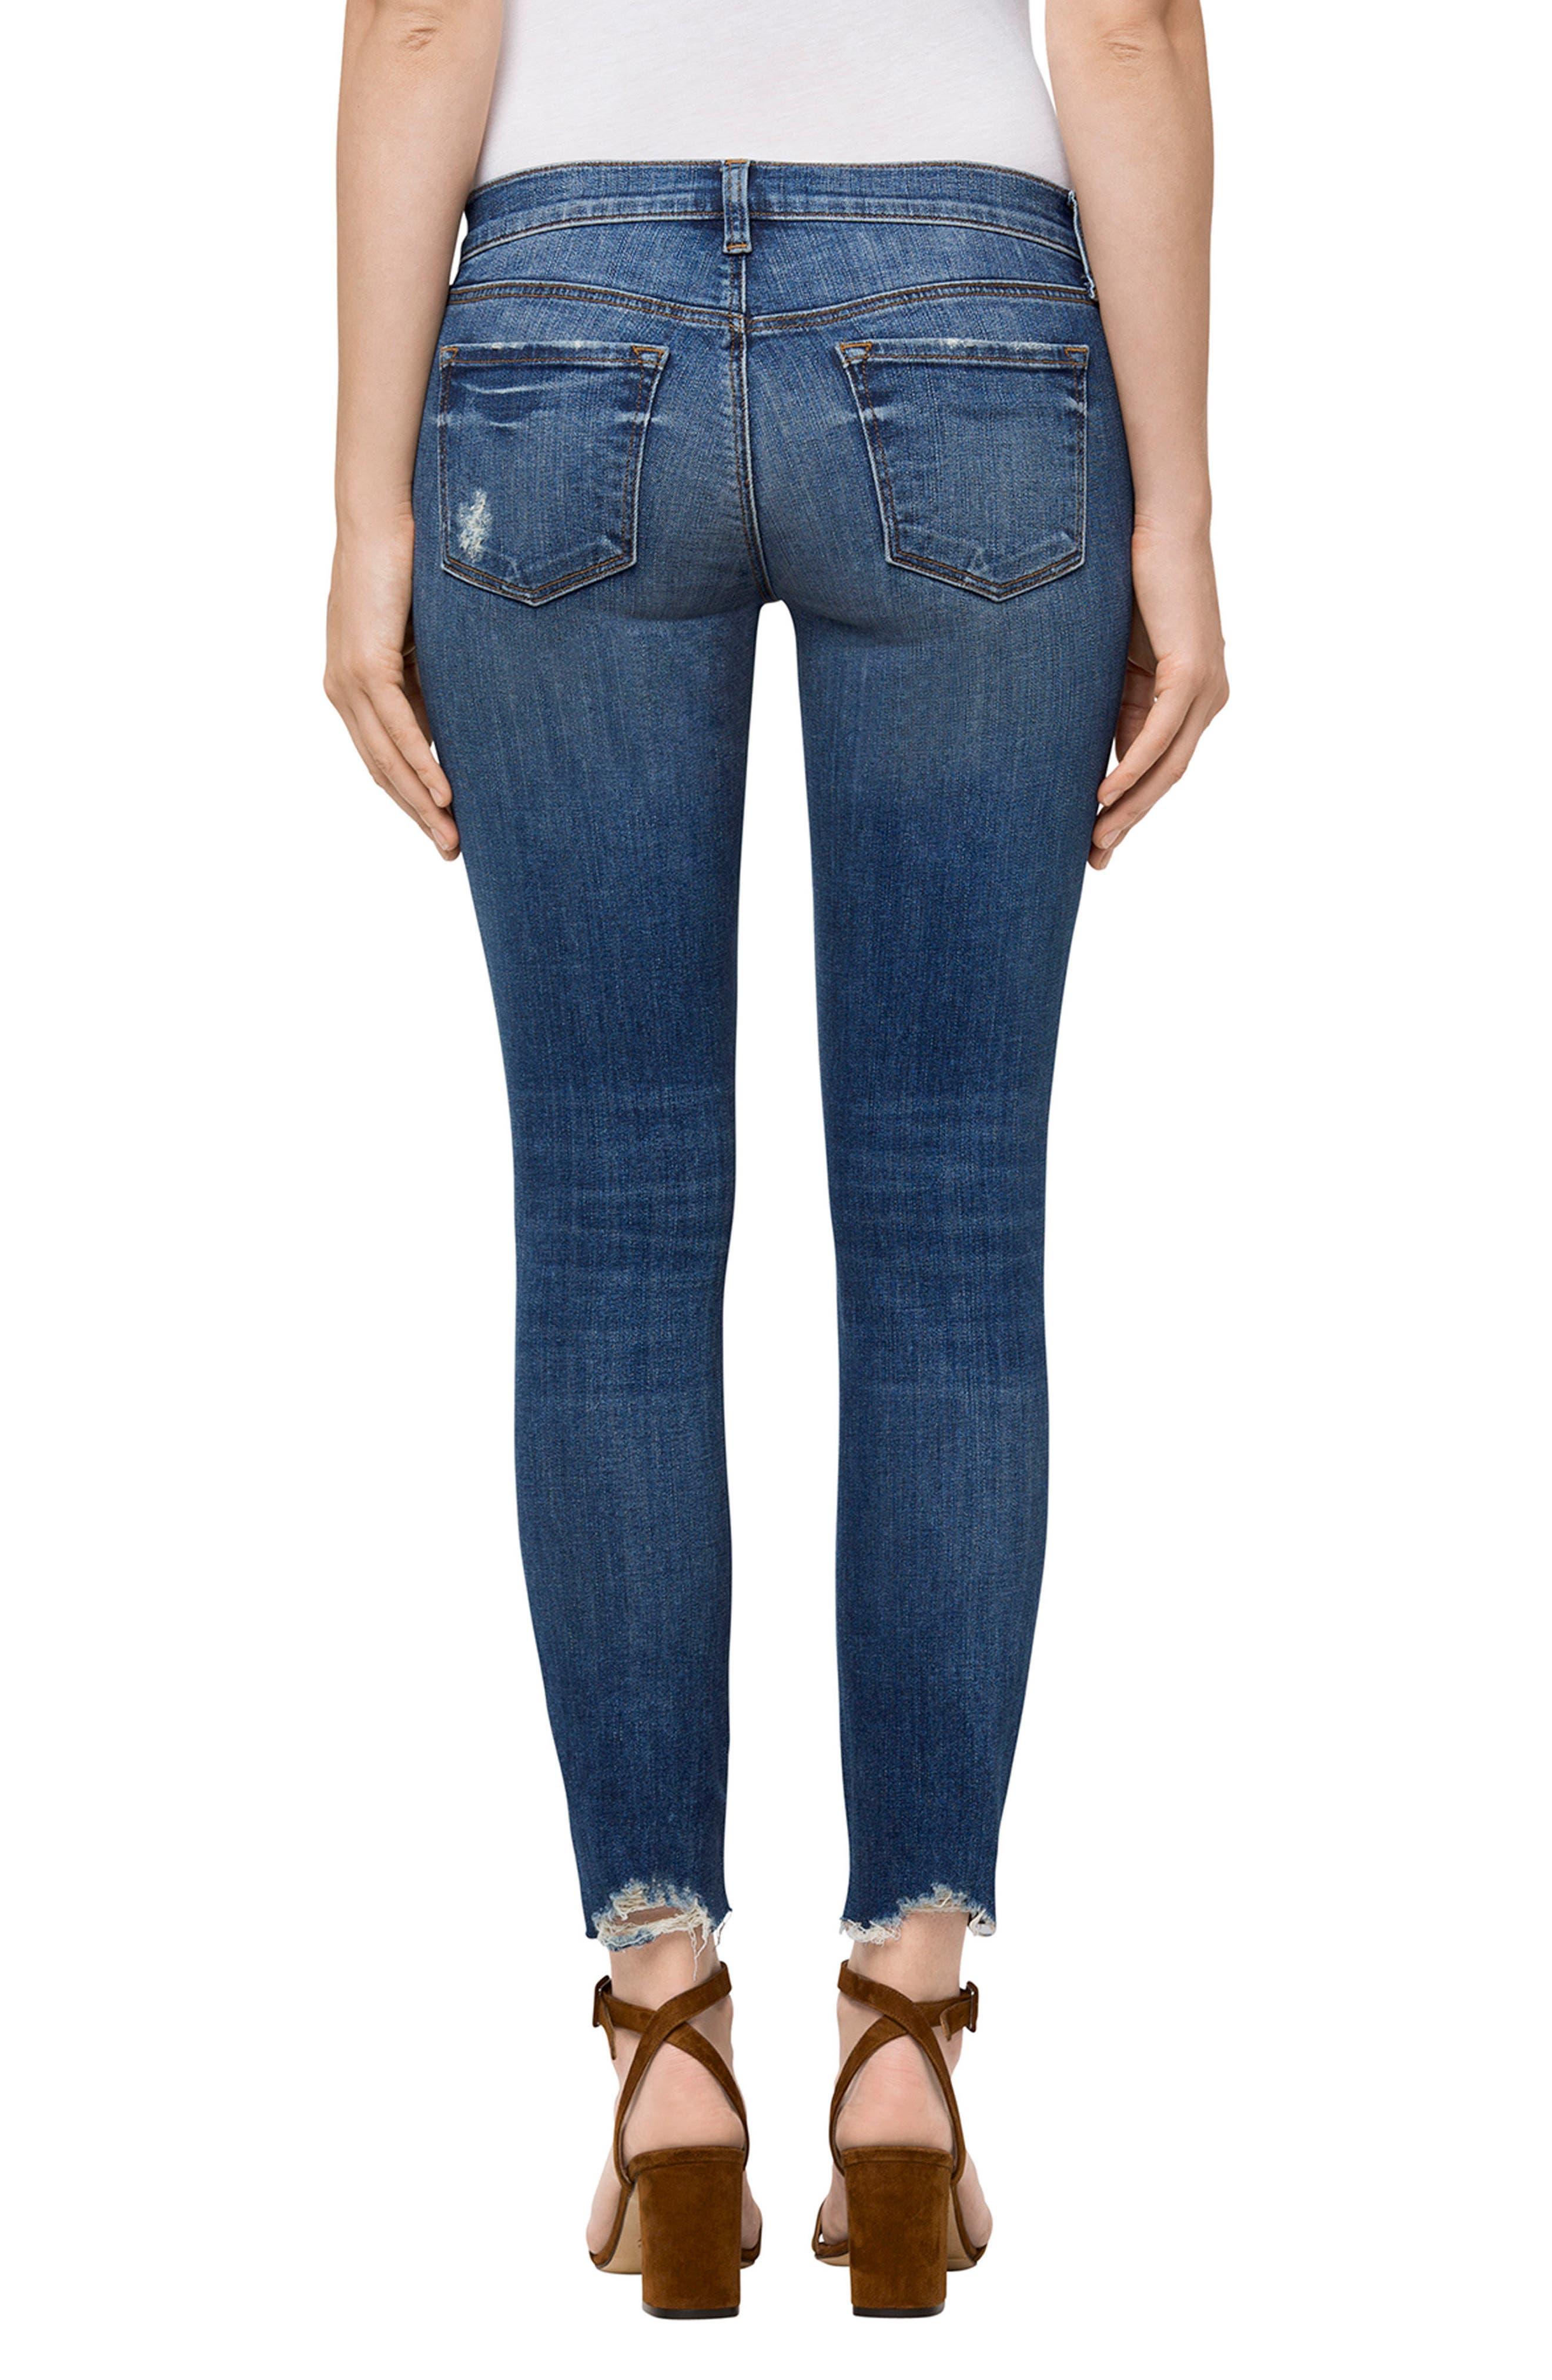 9326 Low Rise Crop Skinny Jeans,                             Alternate thumbnail 2, color,                             435